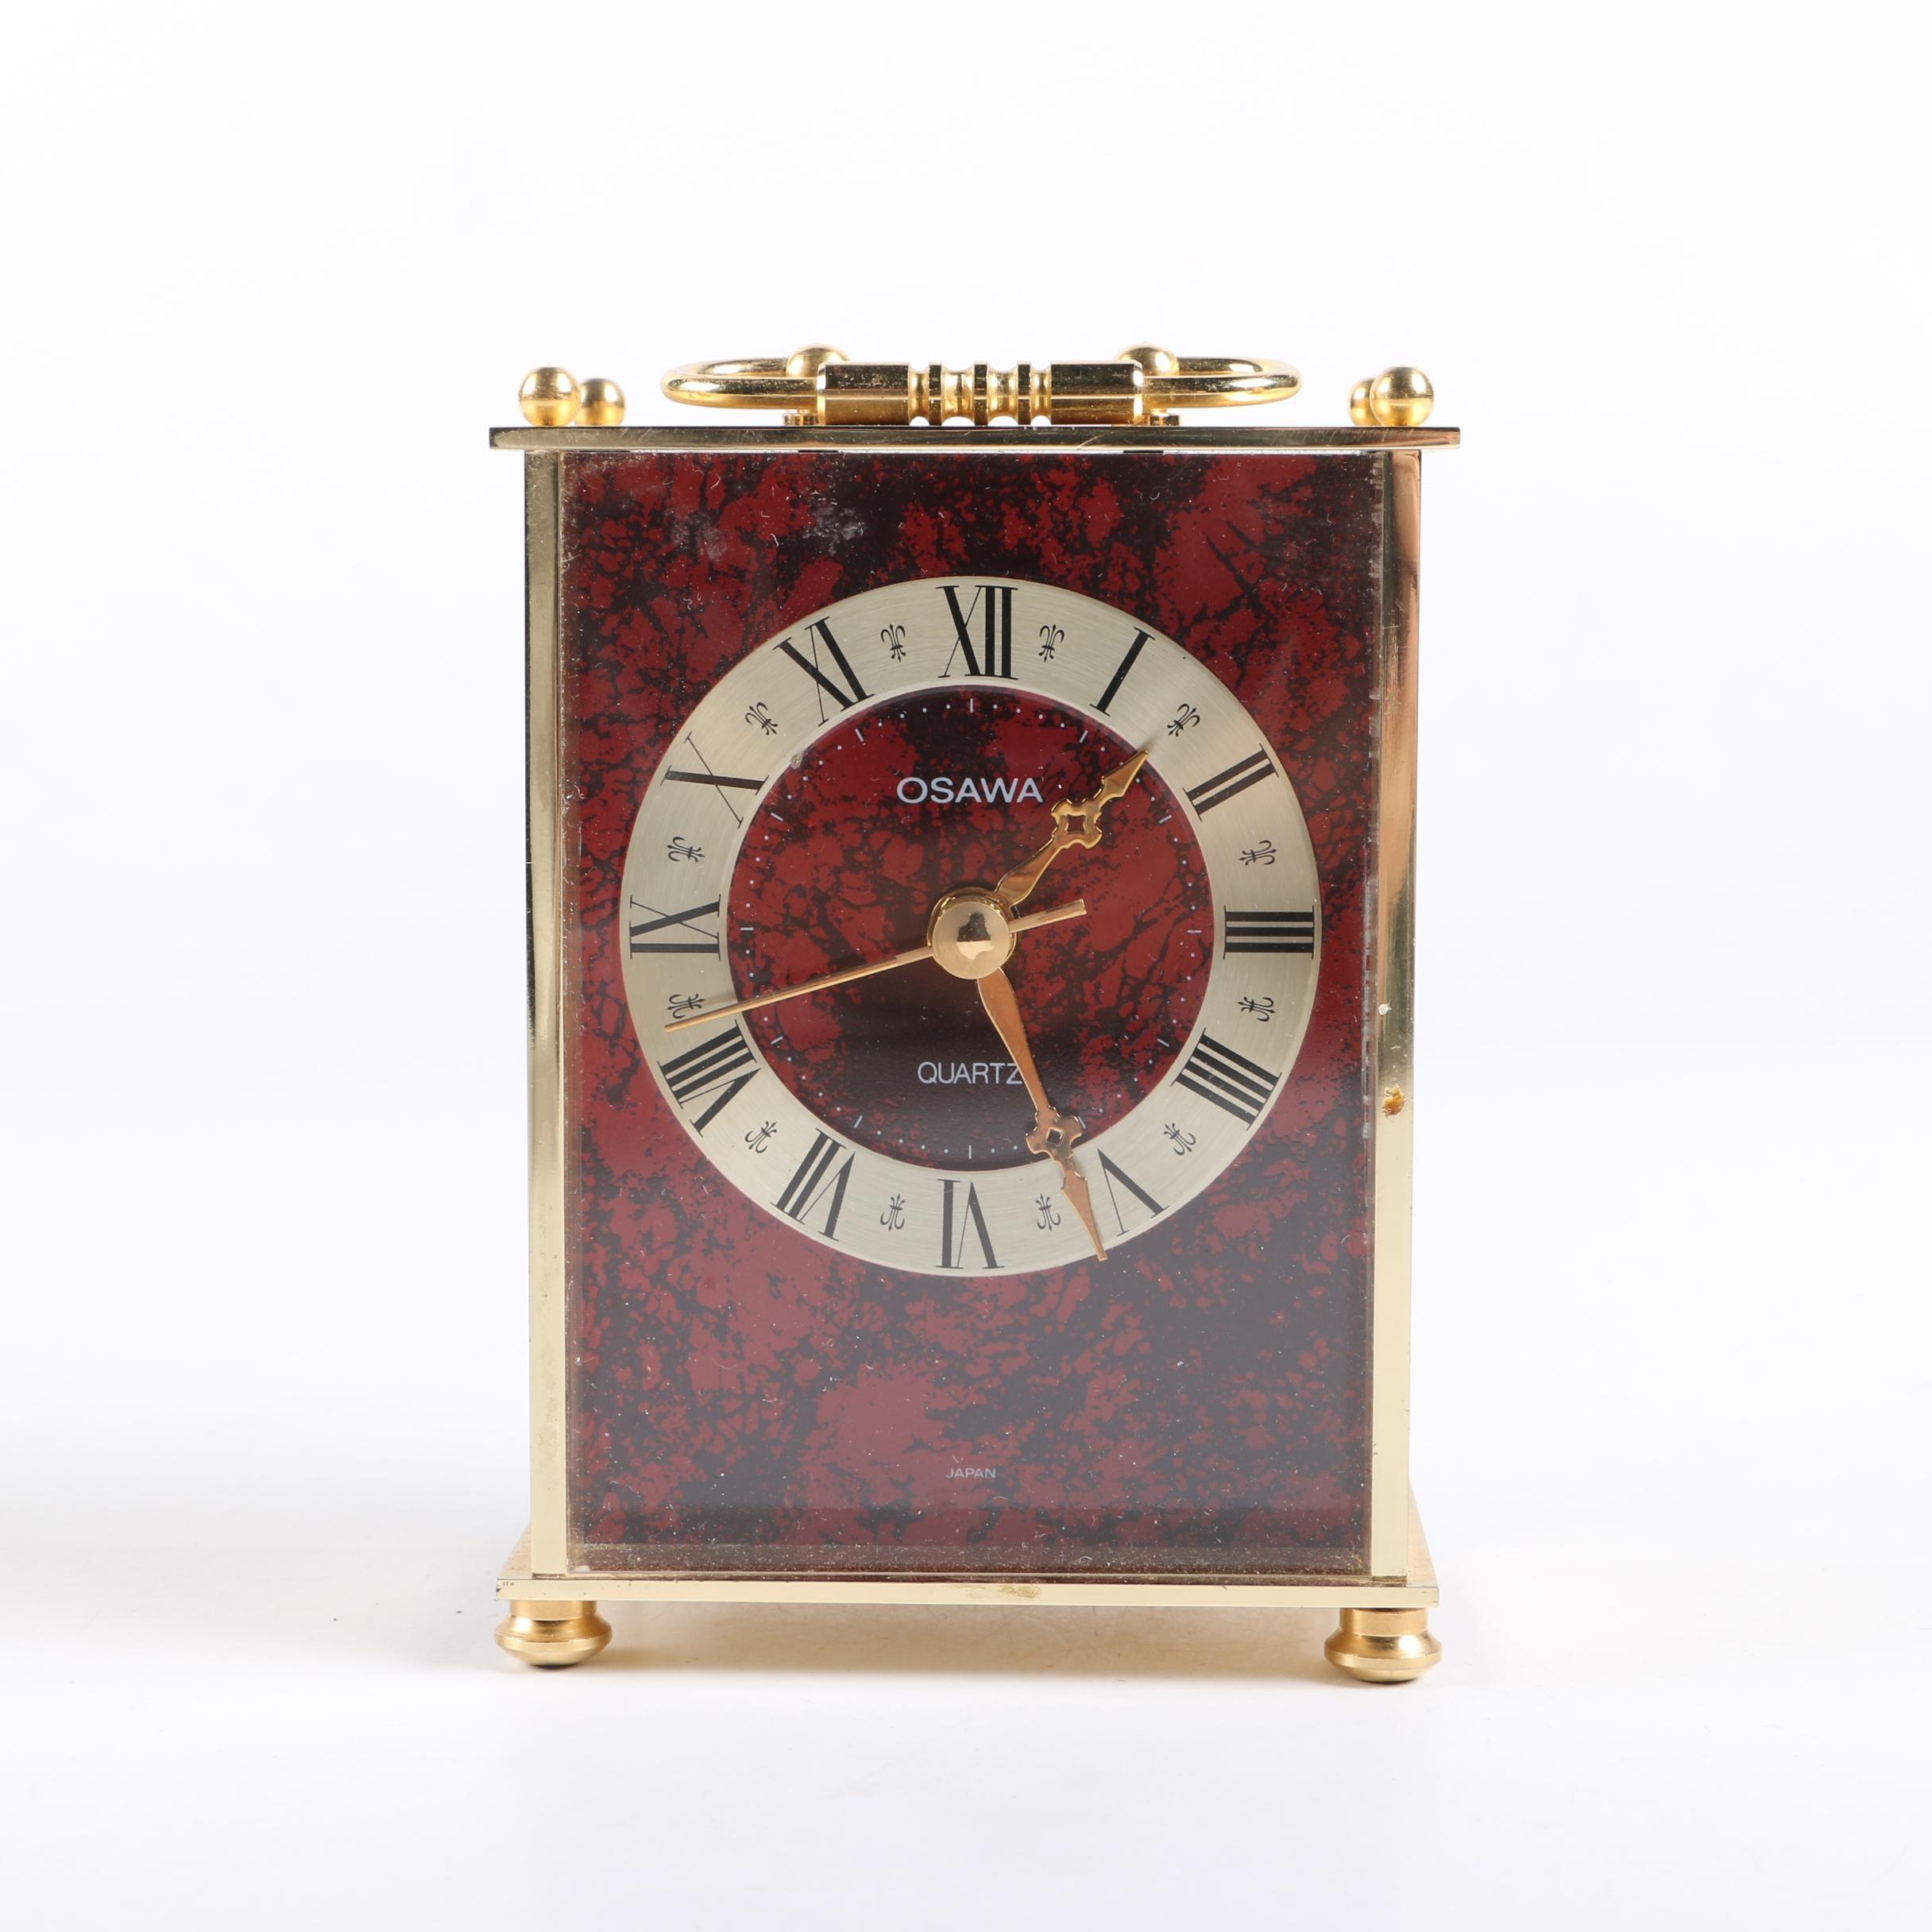 Quartz Operated Desk Clock by Osawa